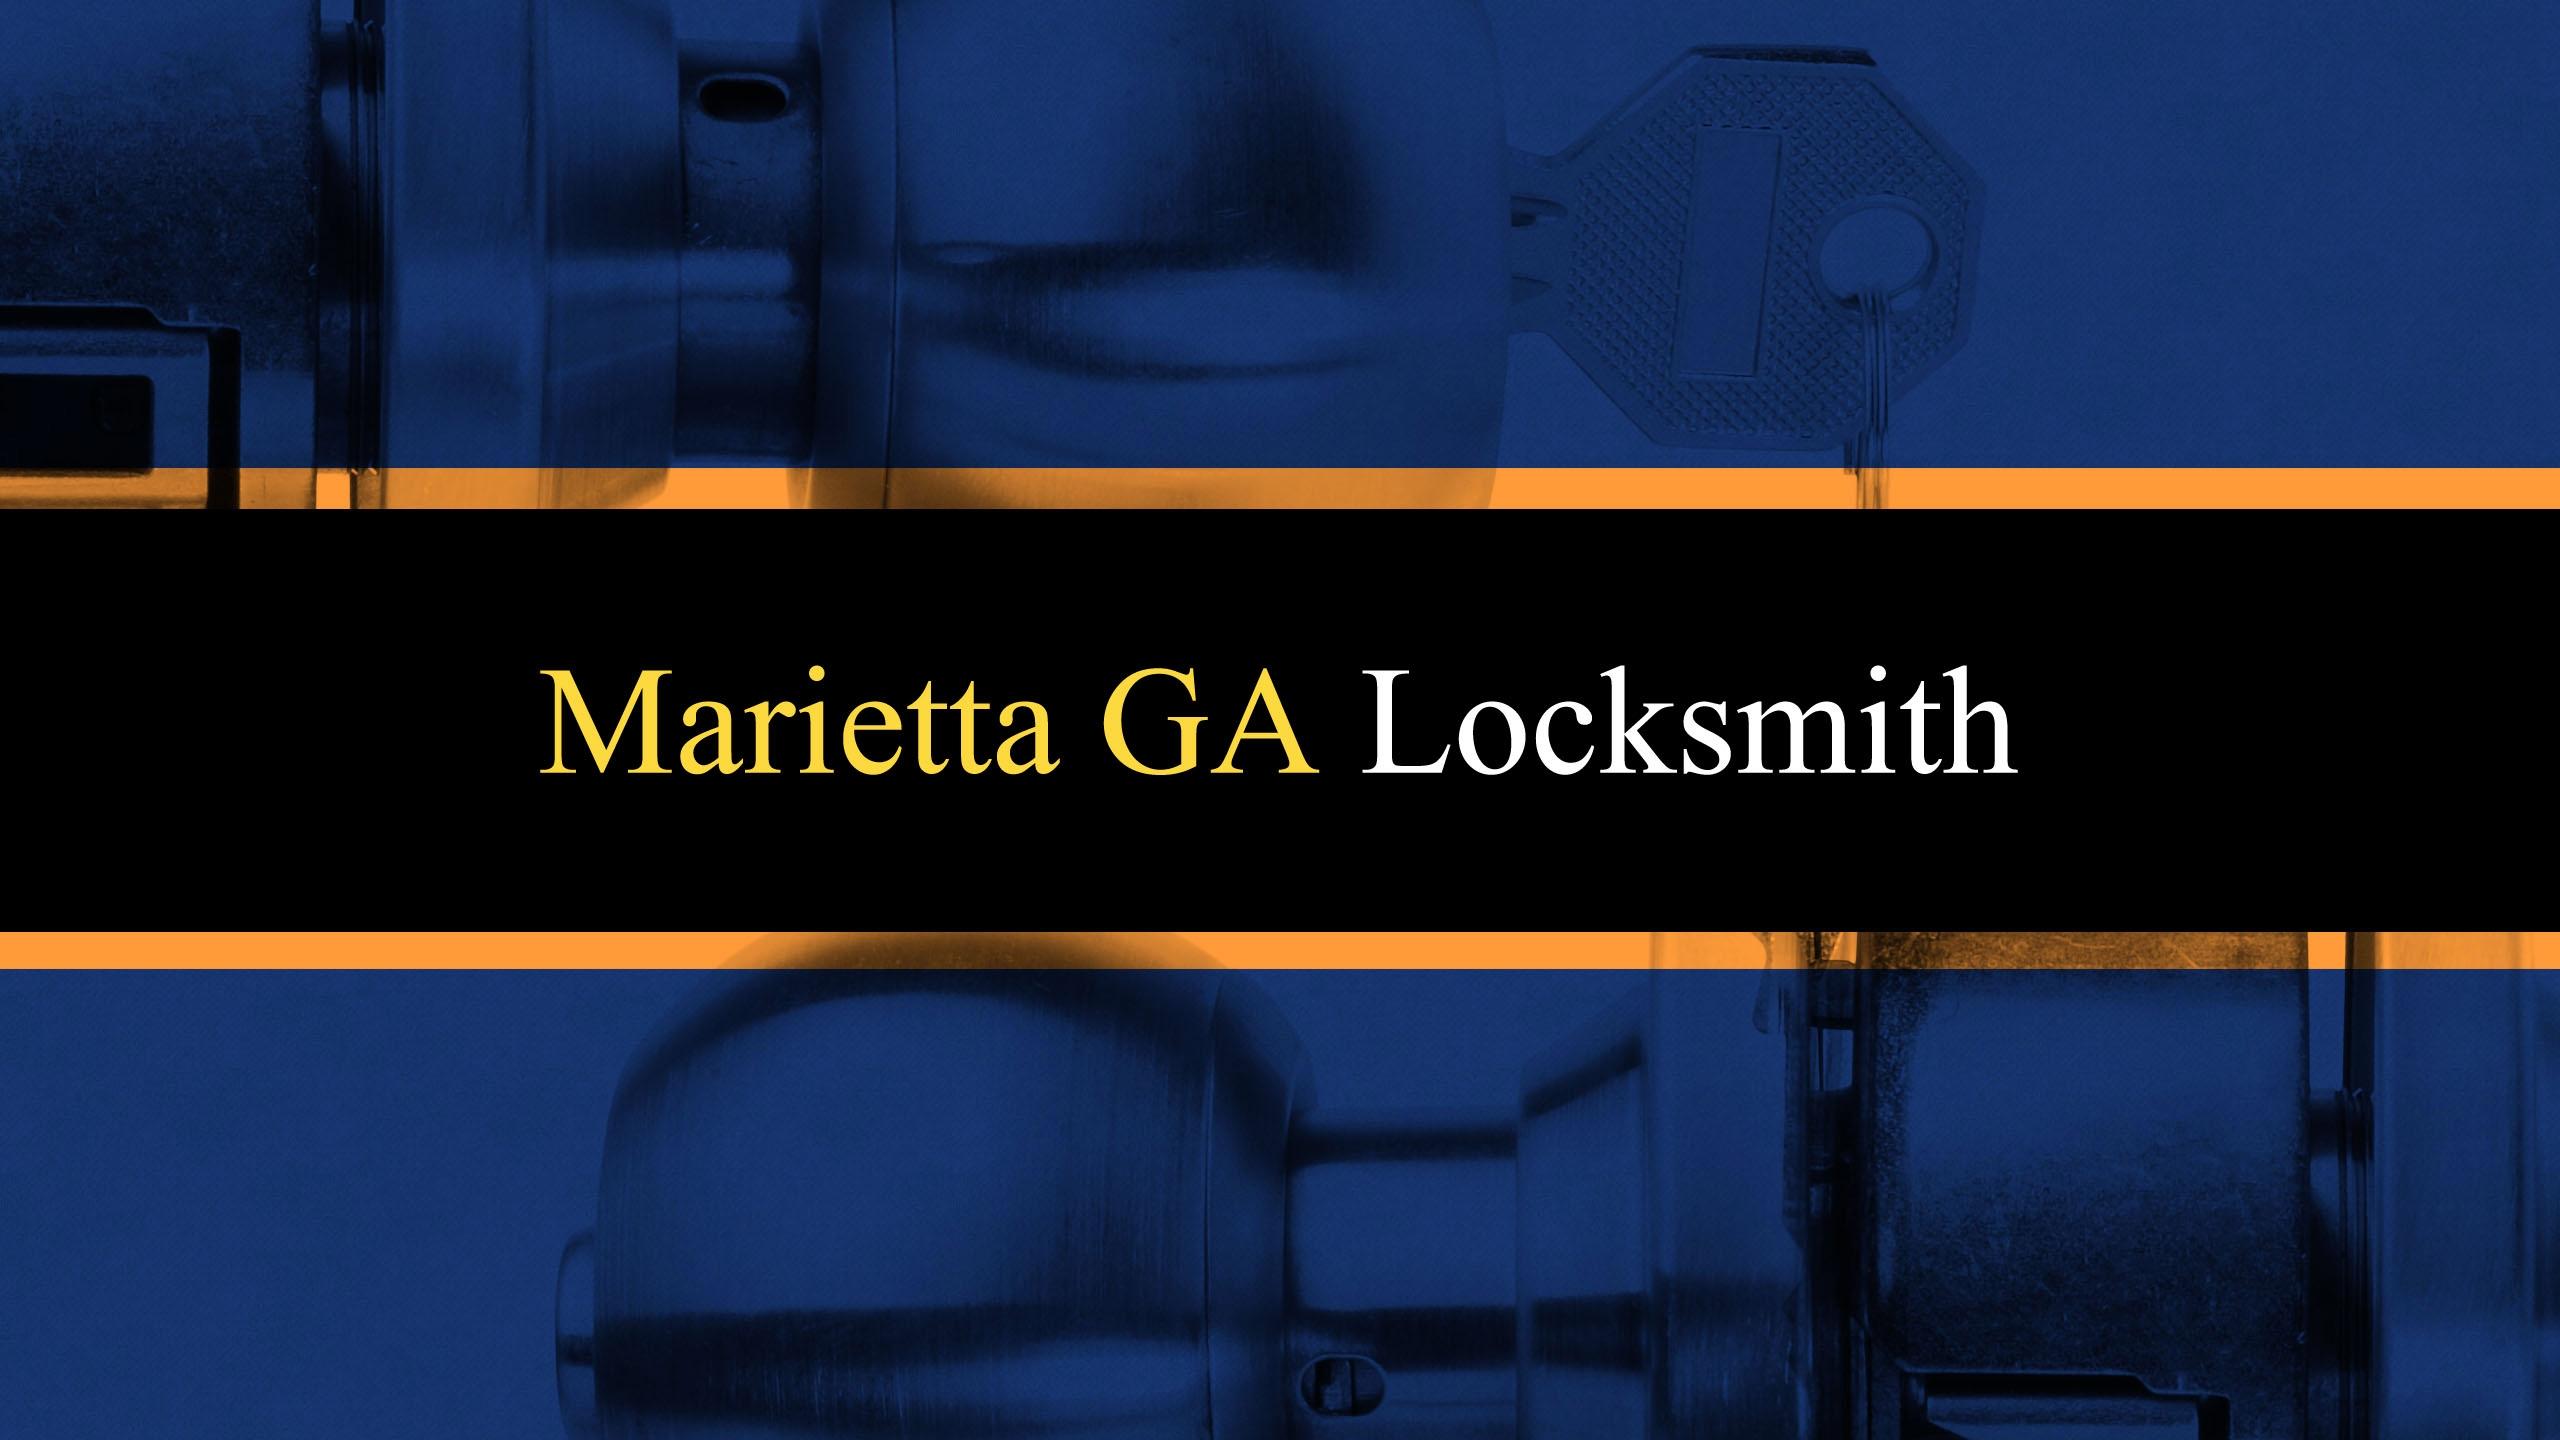 Marietta GA Locksmith (@mariettagalocksmiths) Cover Image